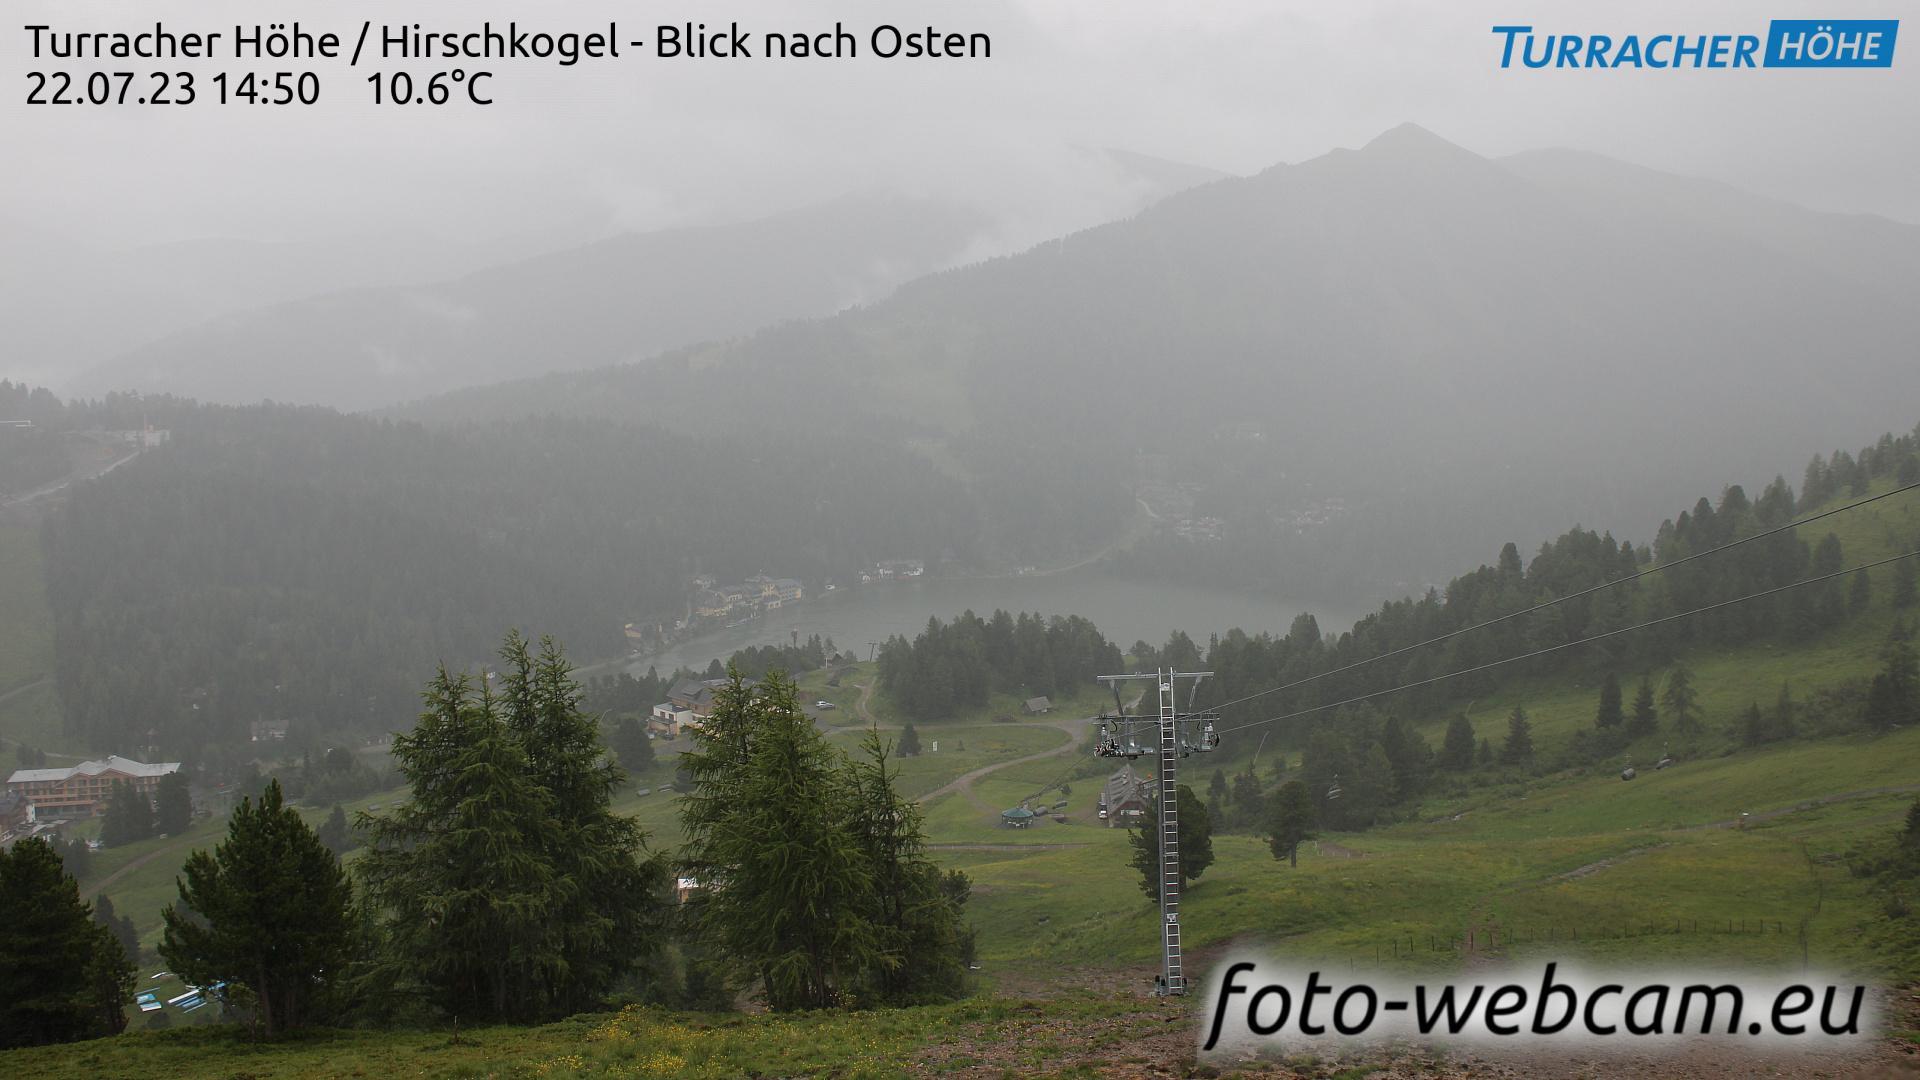 Webkamera Brandstätter: Turracher Höhe − Hirschkogel − Blick